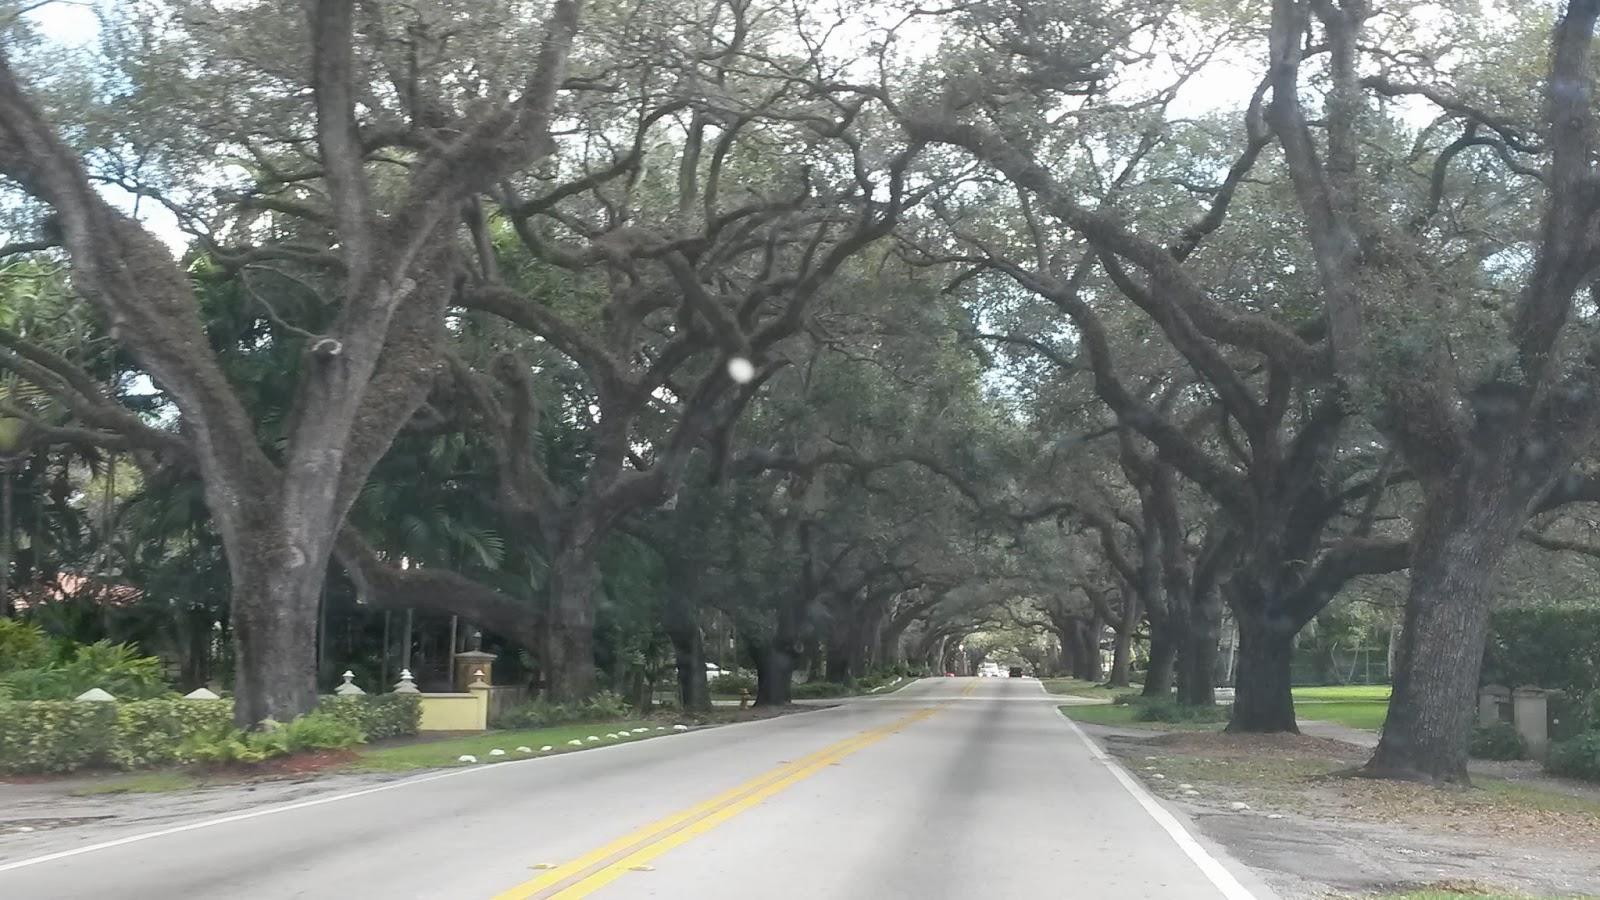 Merrick House, Coral Gables, Miami, Florida, Elisa N, Blog de Viajes, Lifestyle, Travel